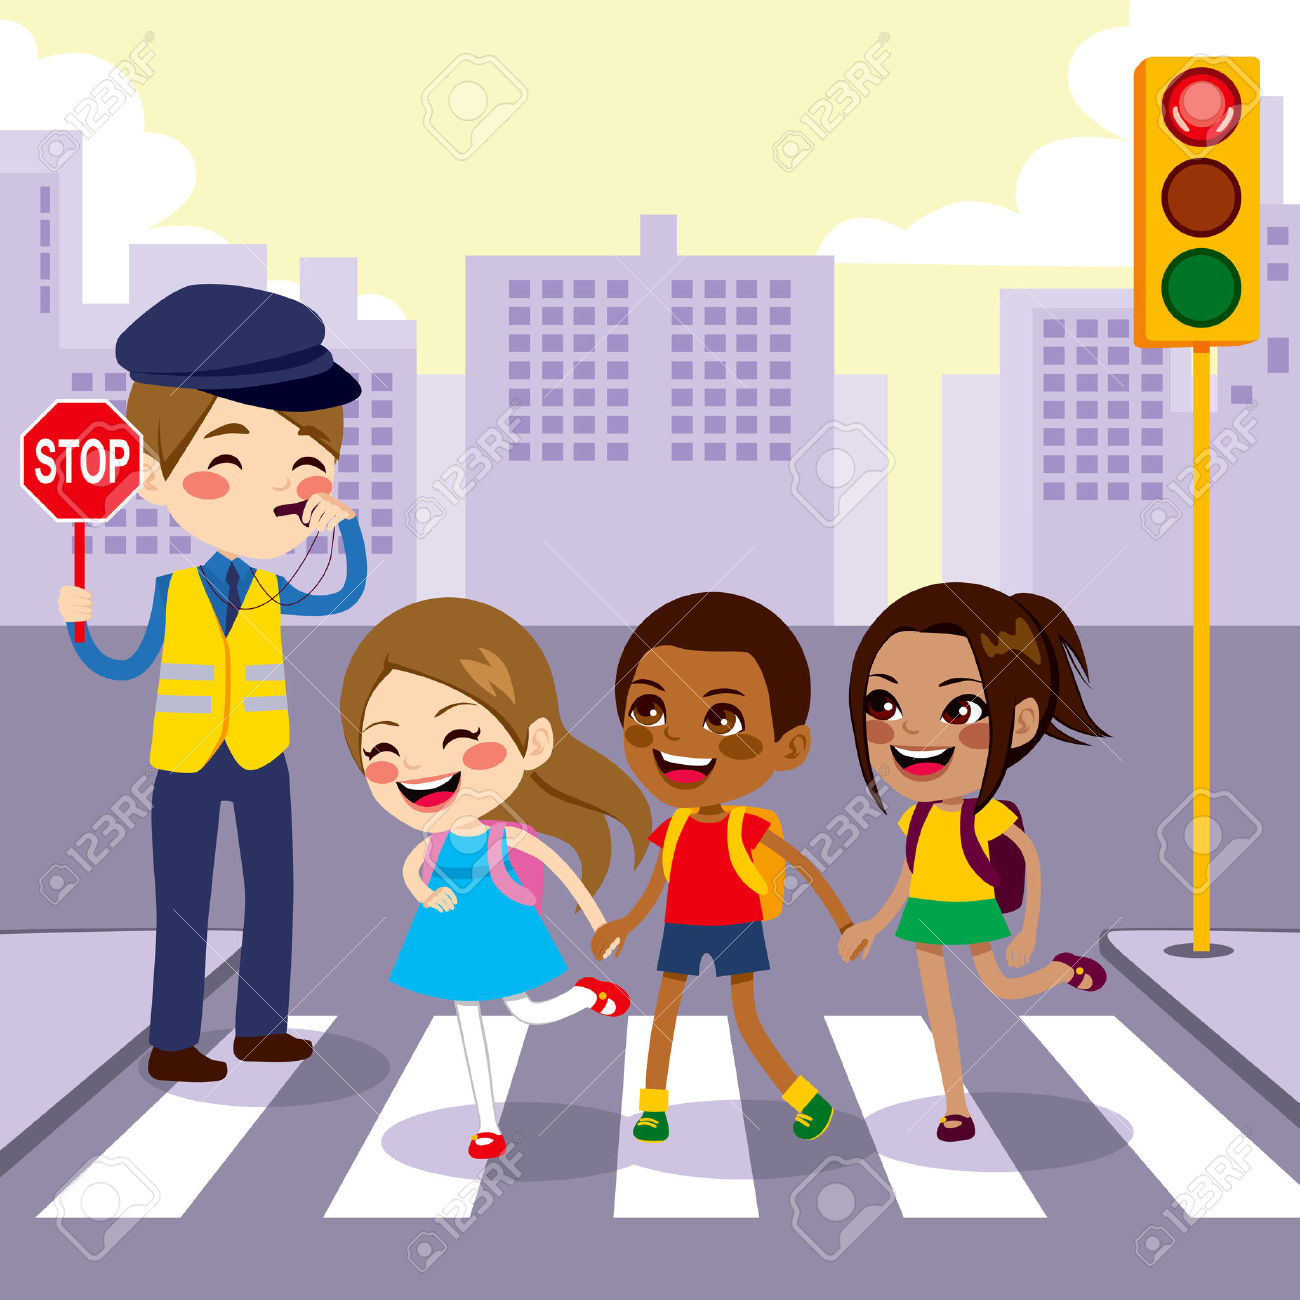 29281148-three-cute-little-school-children-students-crossing-street-walking-through-pedestrian-crossing-with-stock-vector